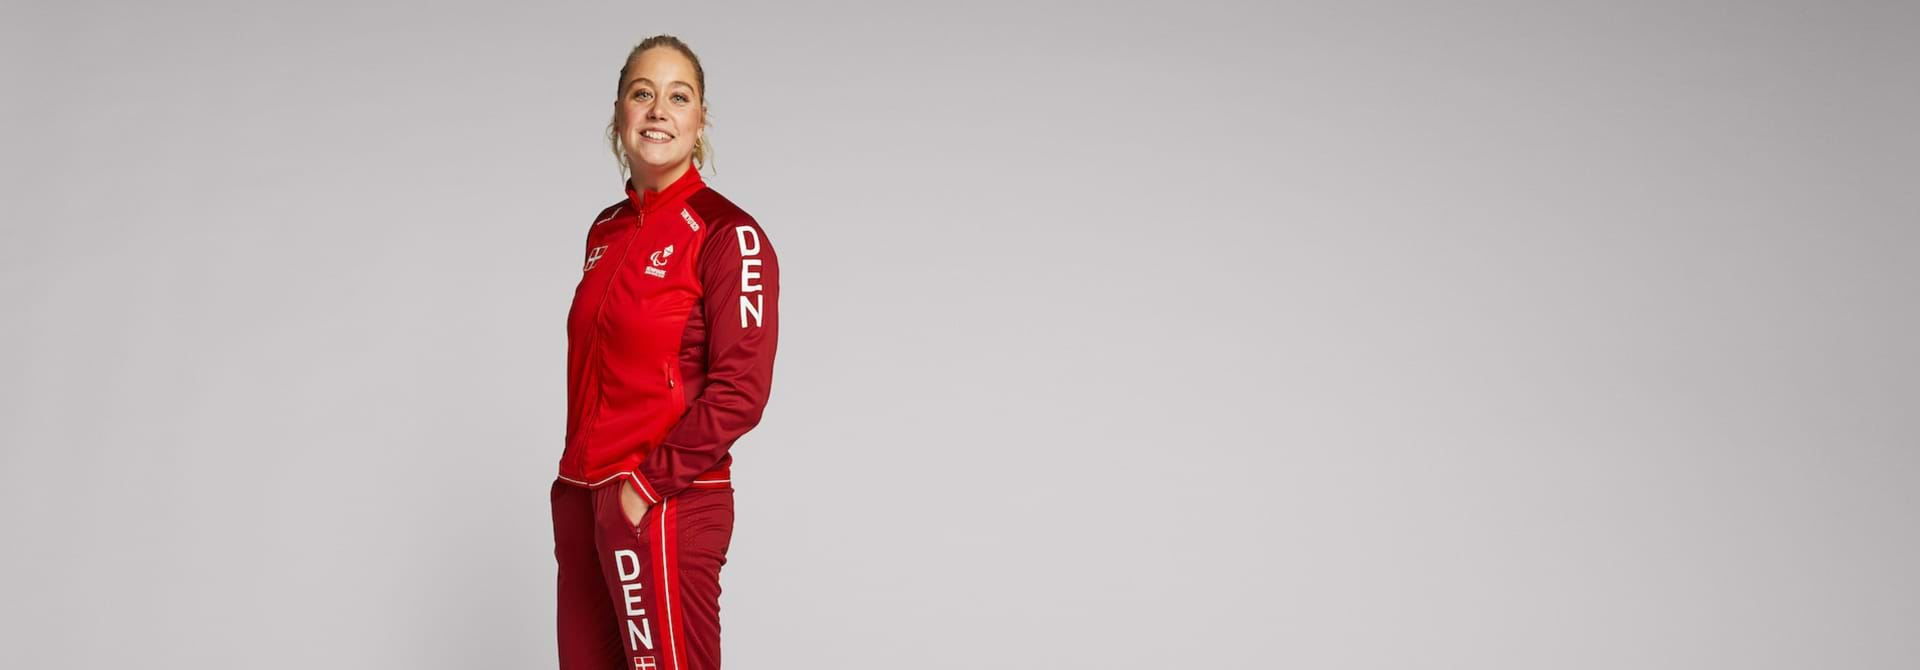 Amalie Vinther